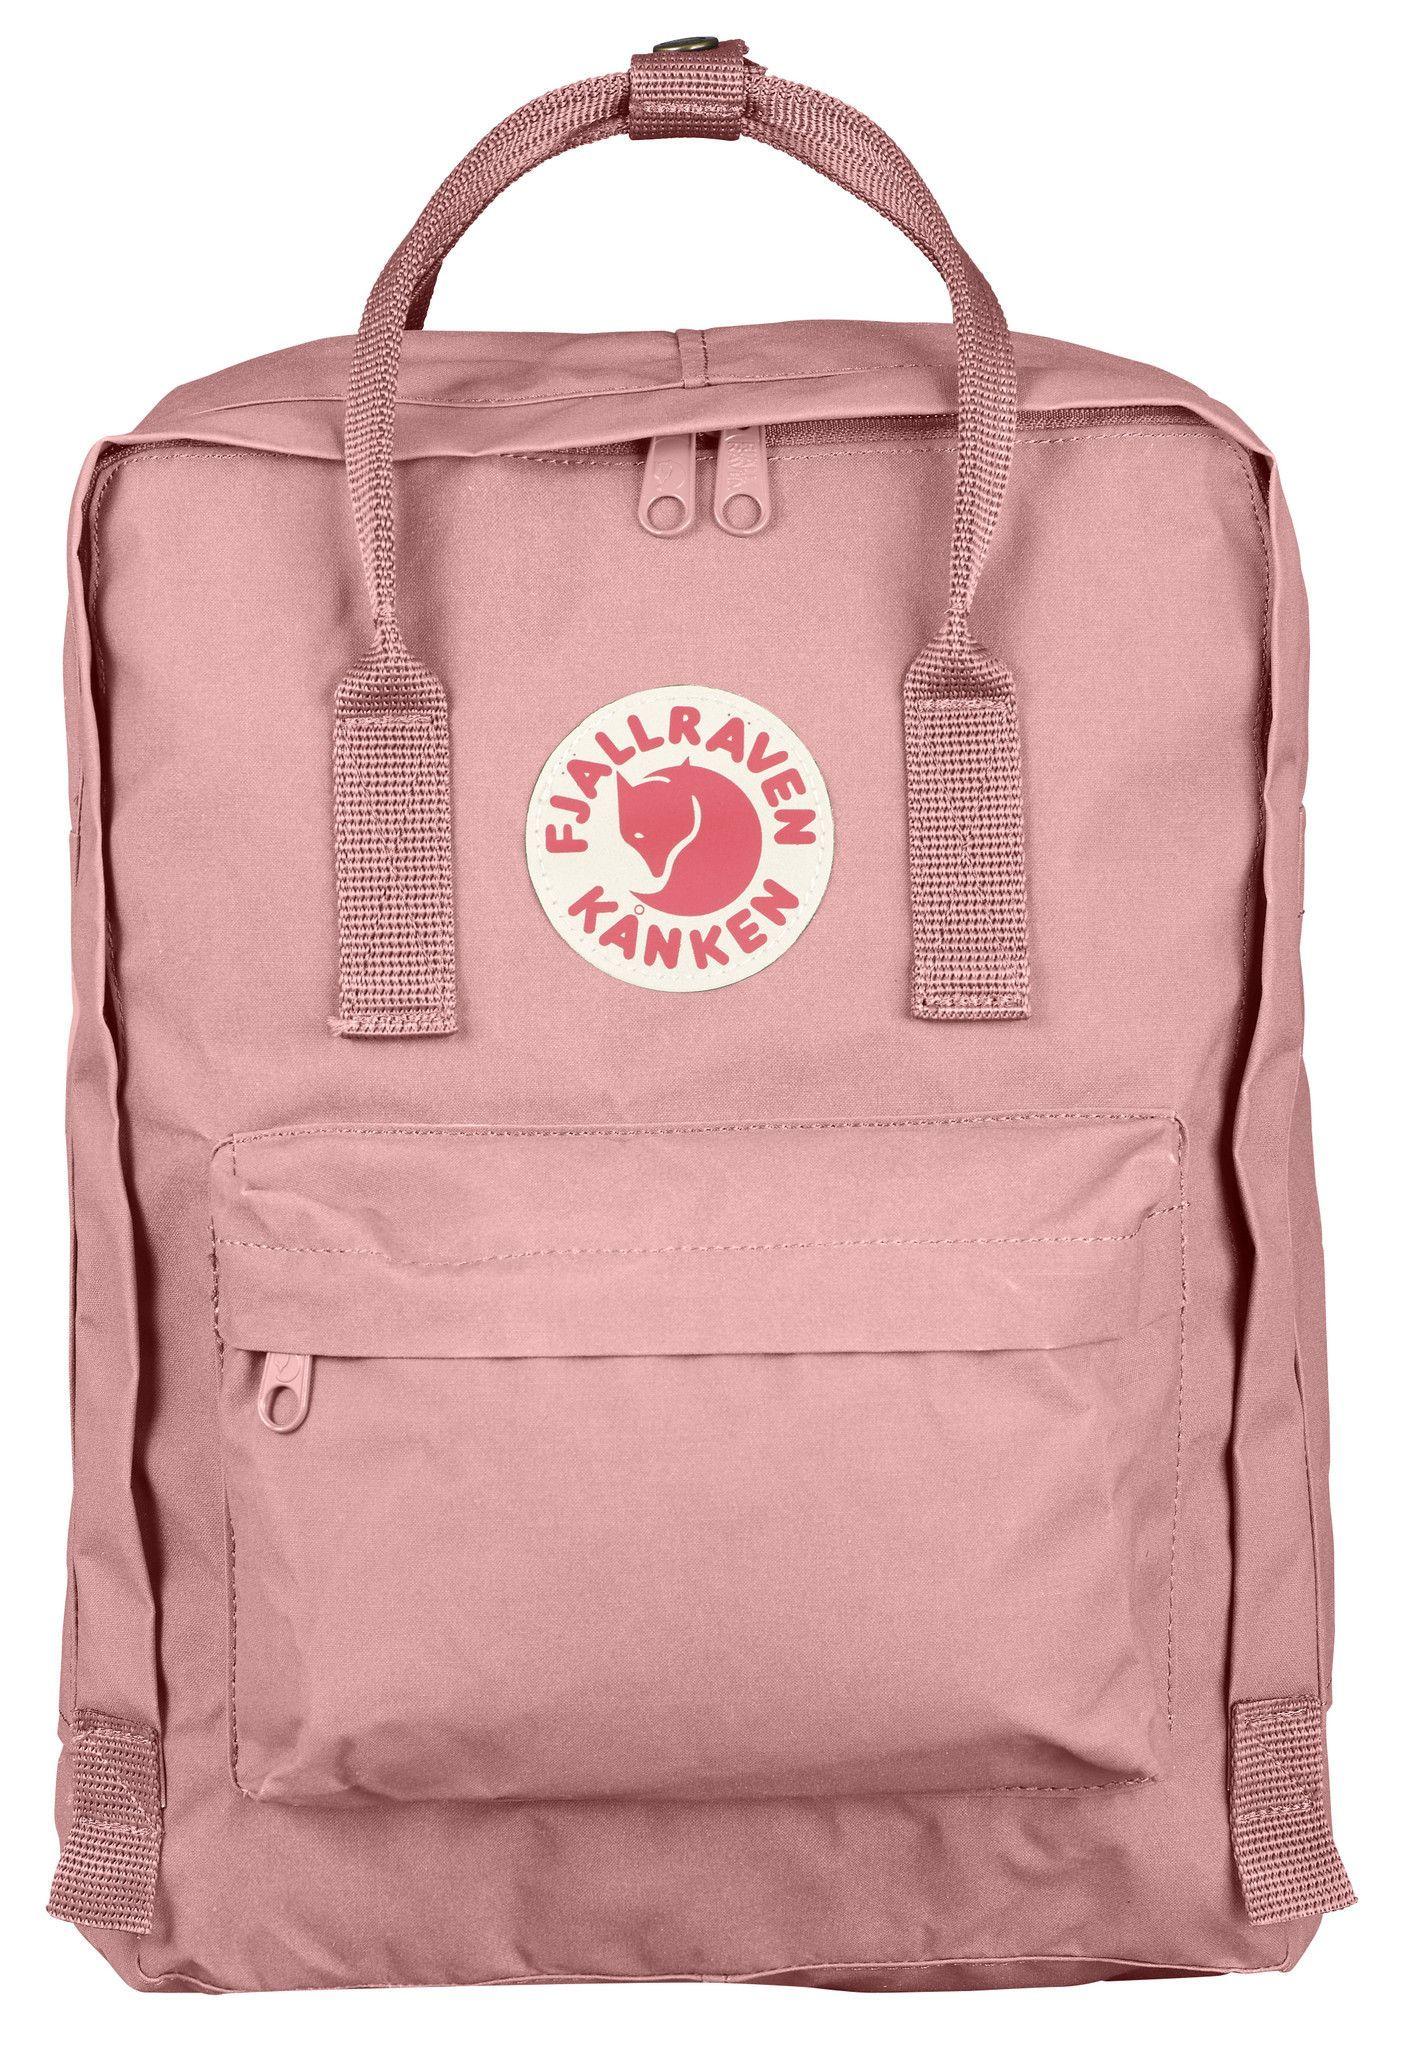 Classic Kanken Backpack Backpack Fjallraven Classic Backpack Kanken Backpack